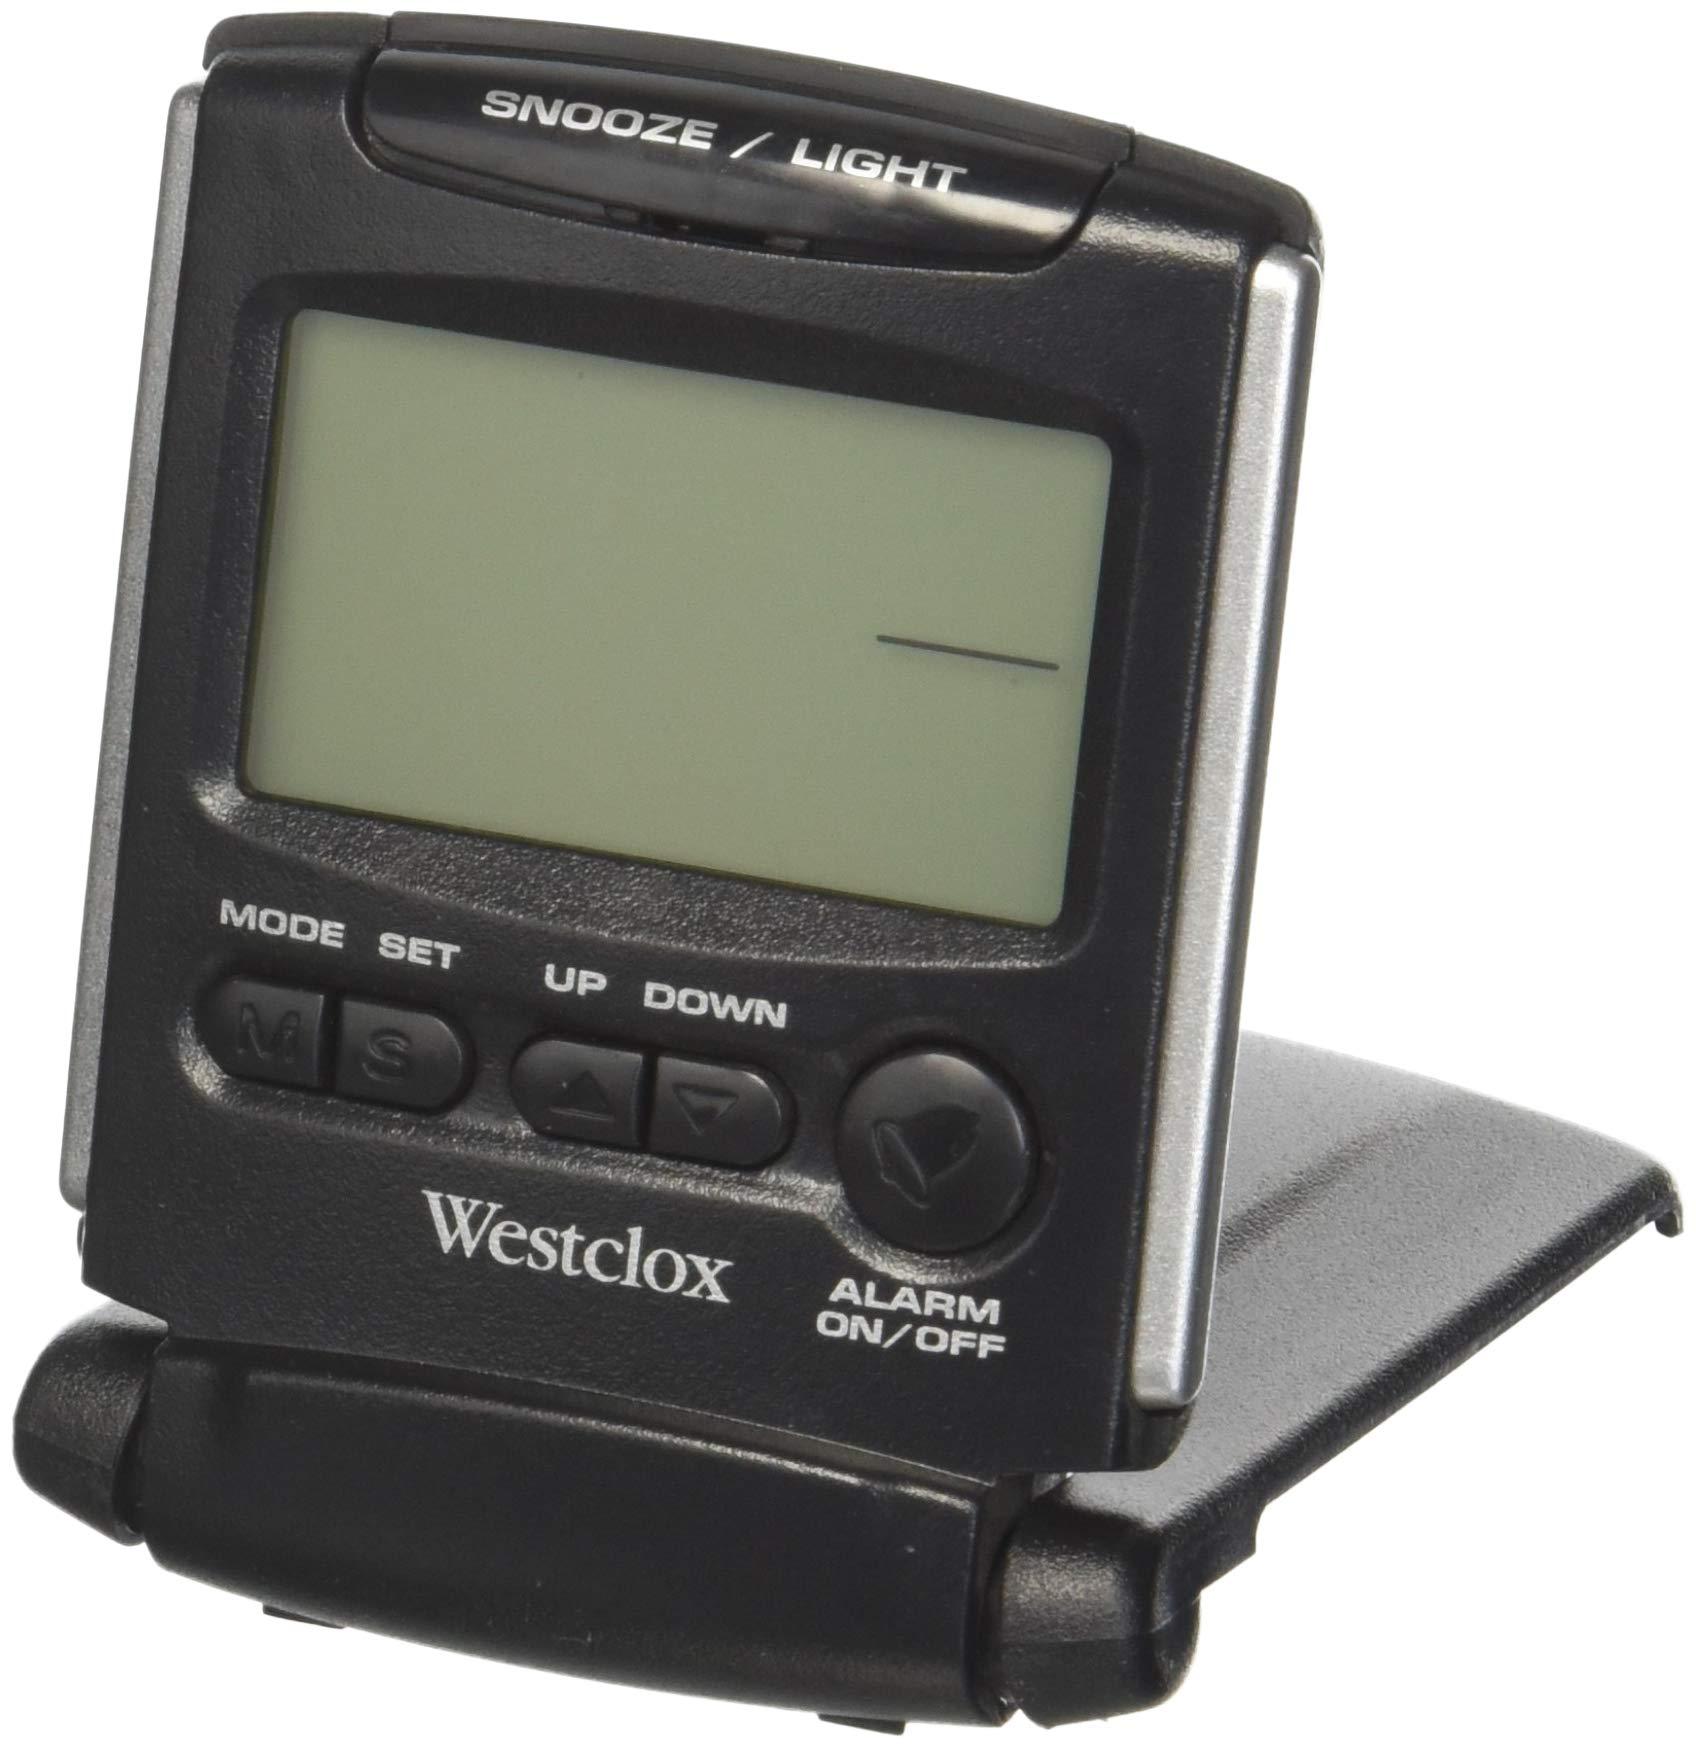 Westclox 72028 Fold-Up Travel Alarm Clock, Medium, Black